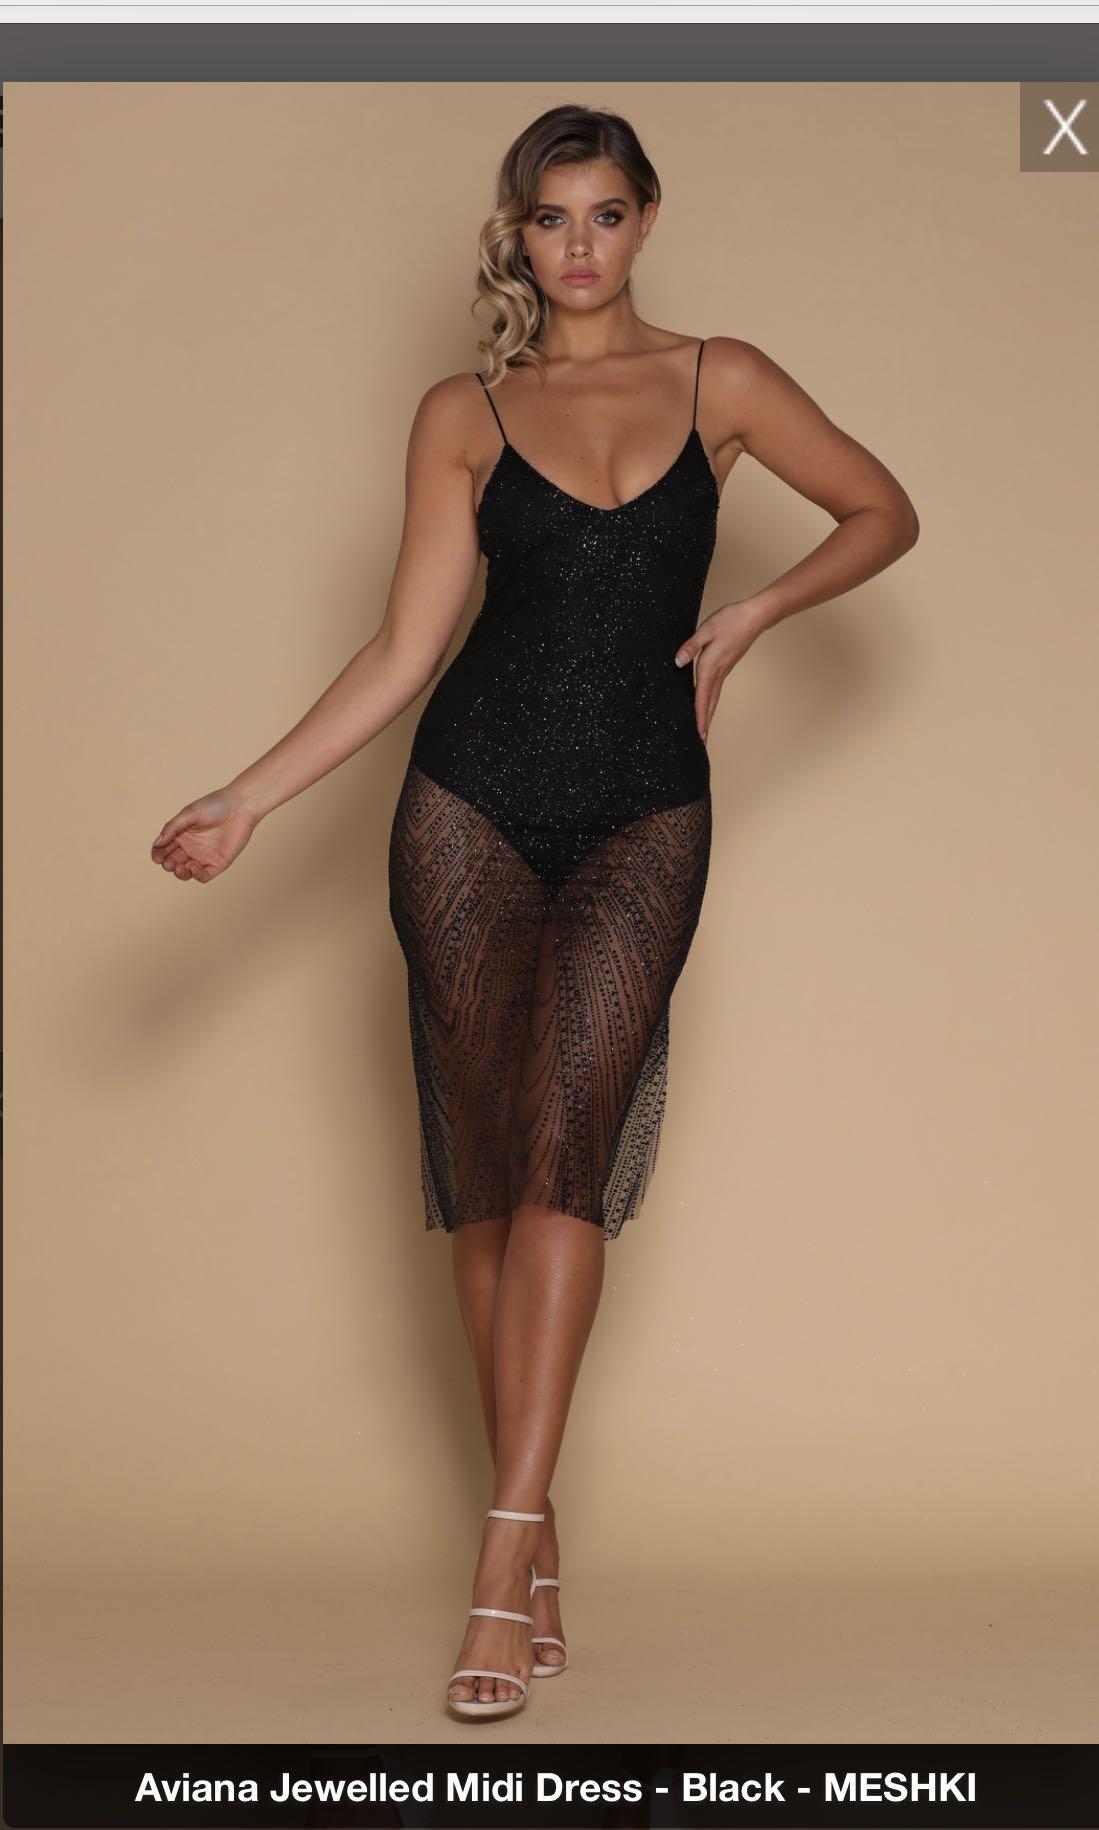 ead01e8d040e Meshki Aviana Jewelled Mini Dress, Women's Fashion, Clothes on Carousell